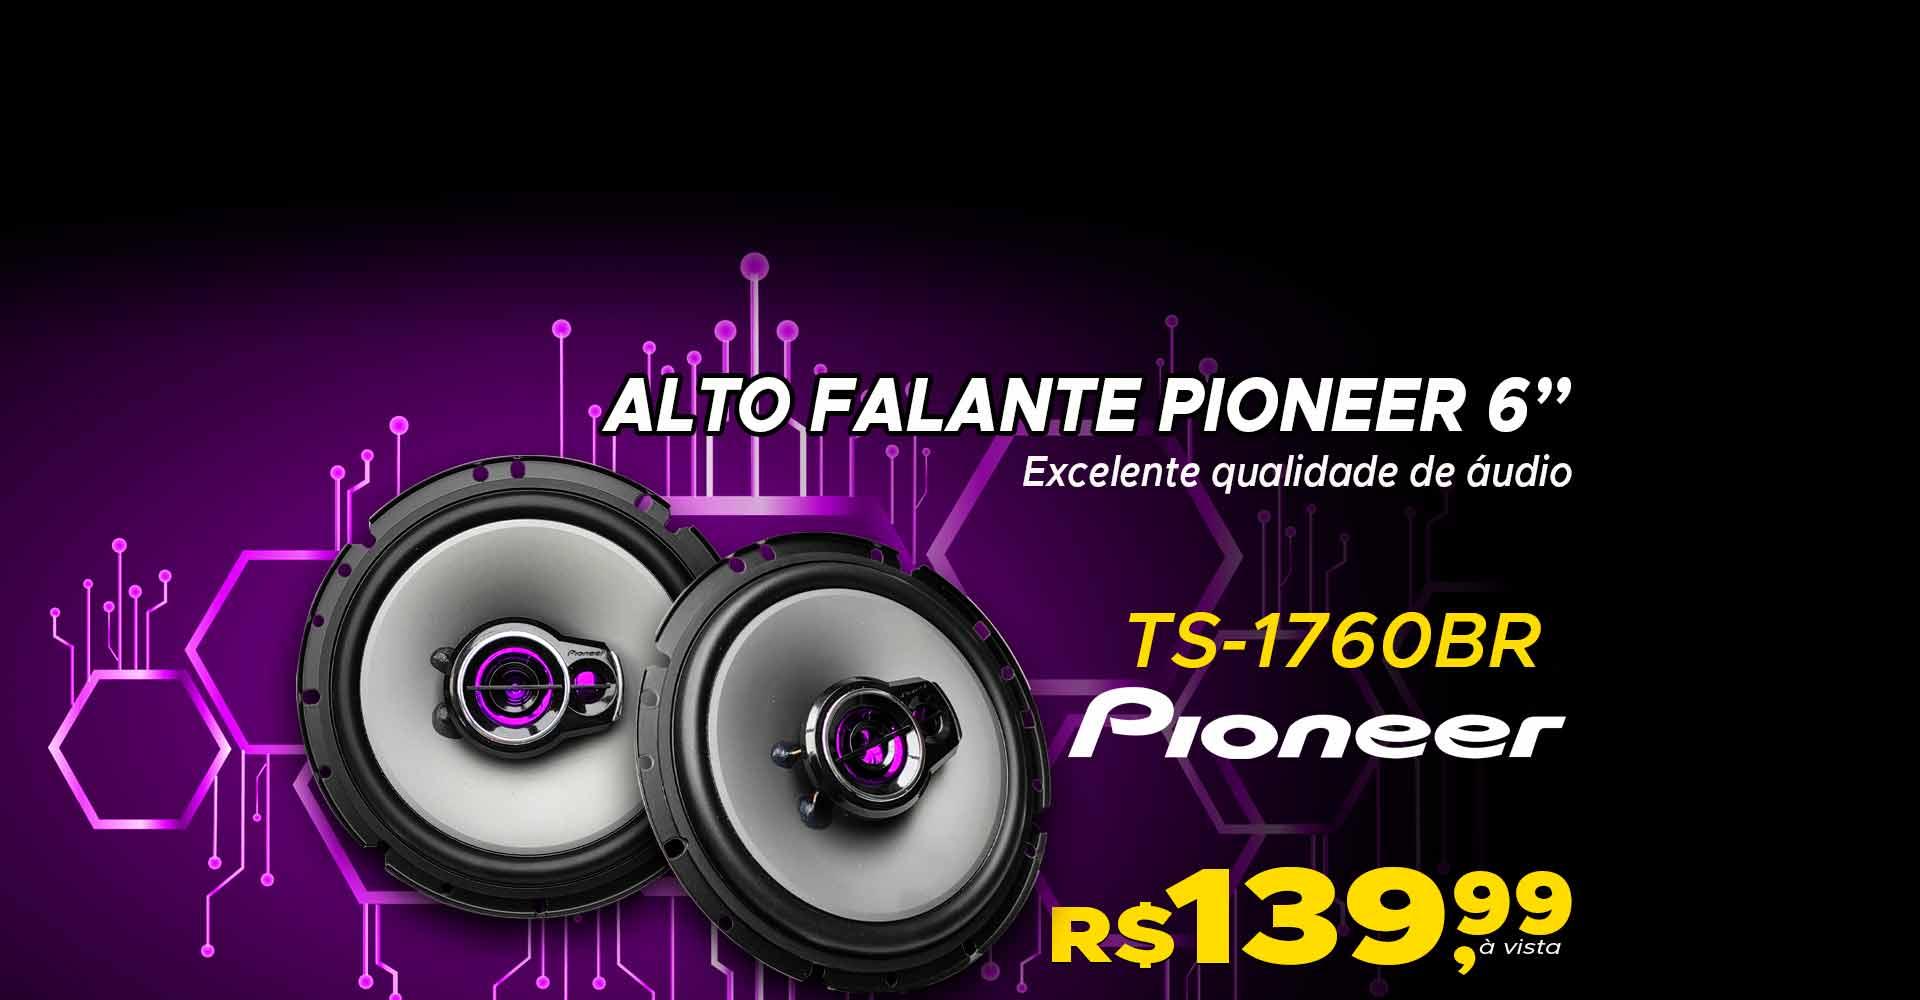 Falante Pioneer TS 1760BR